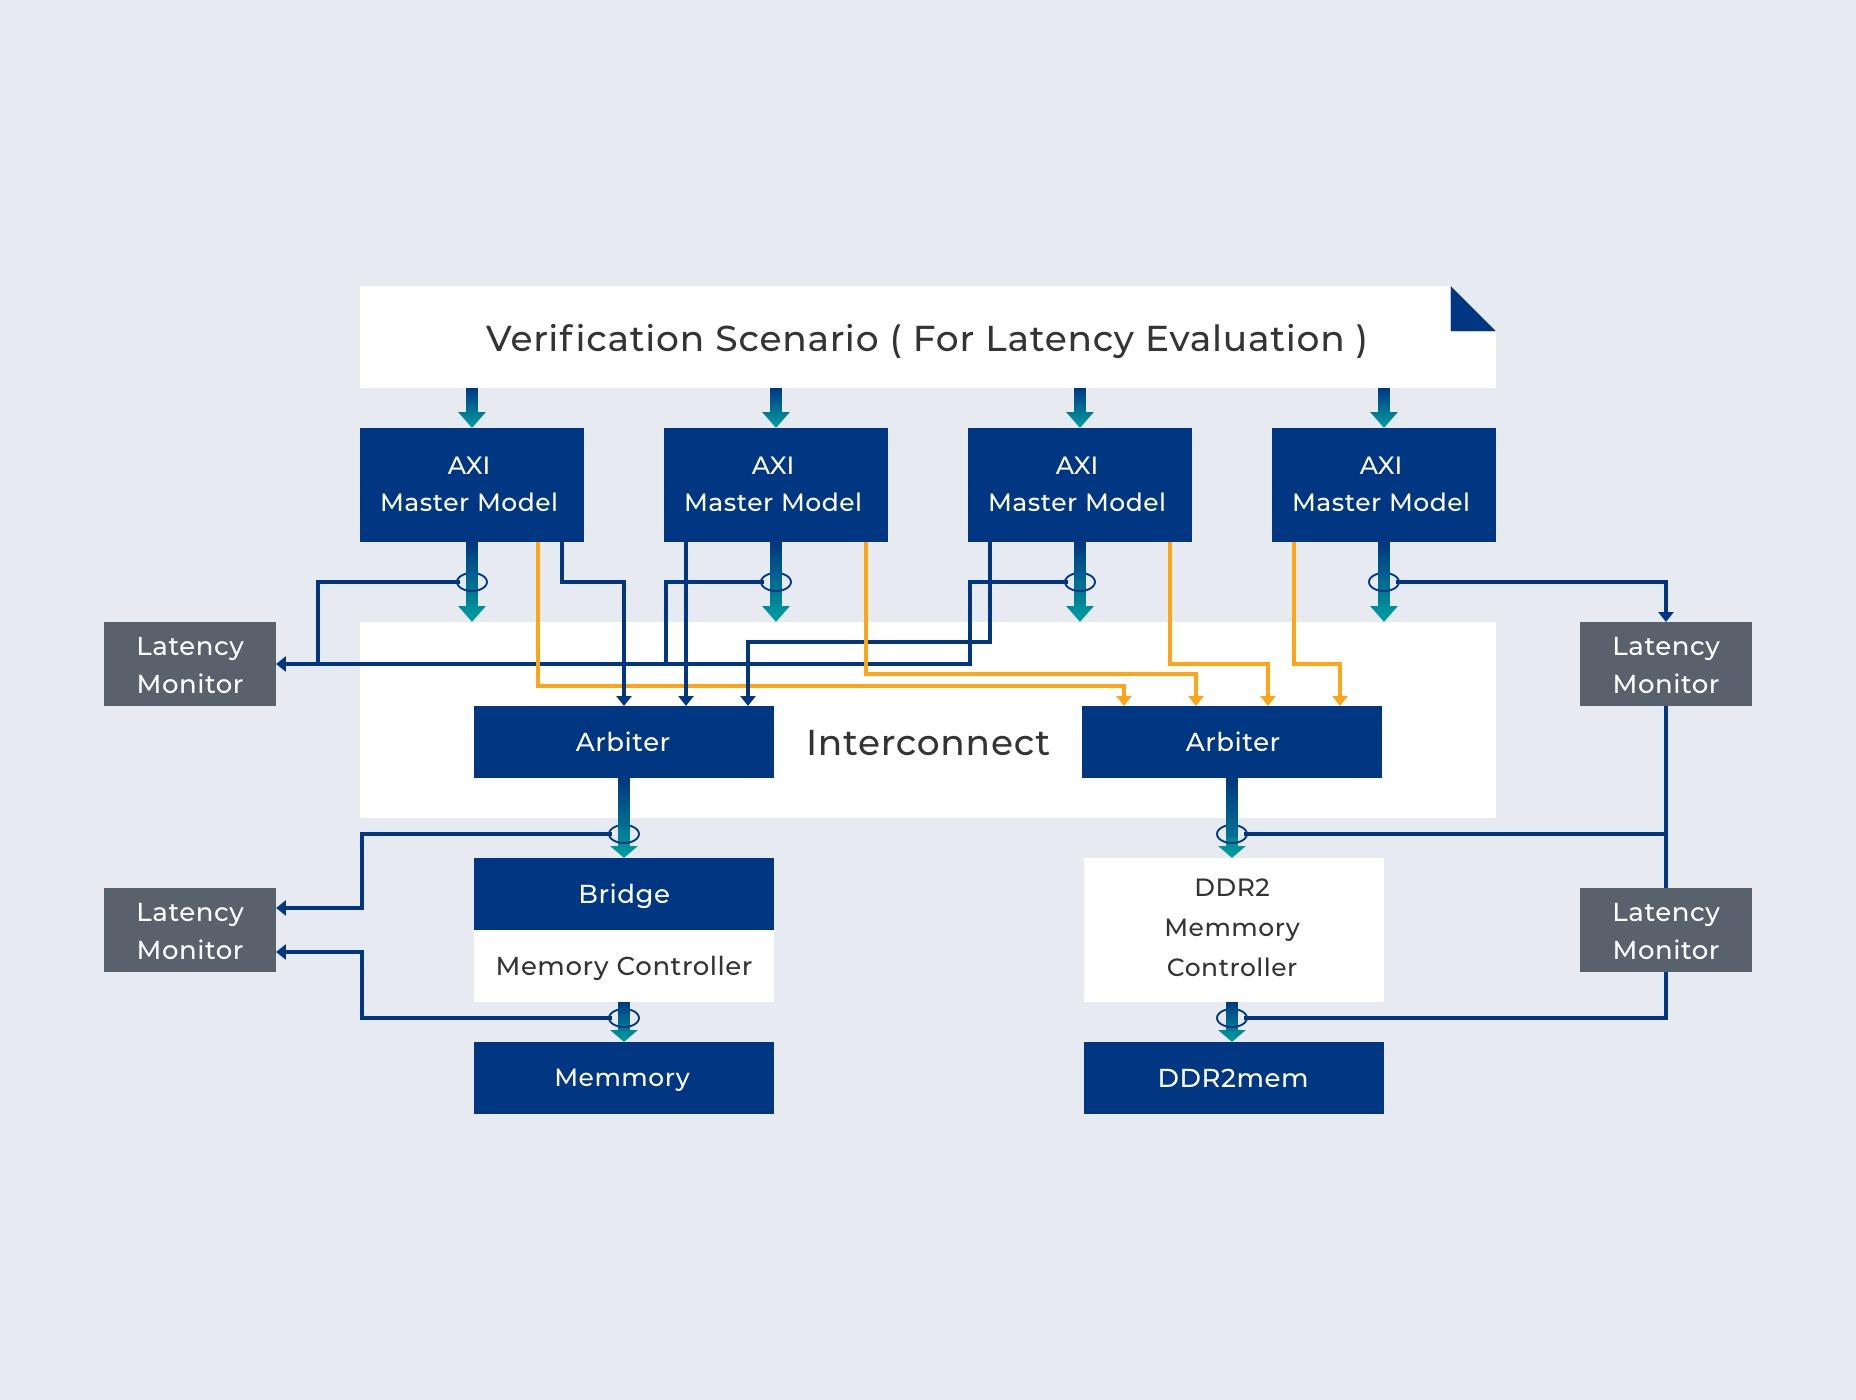 System Verification Services